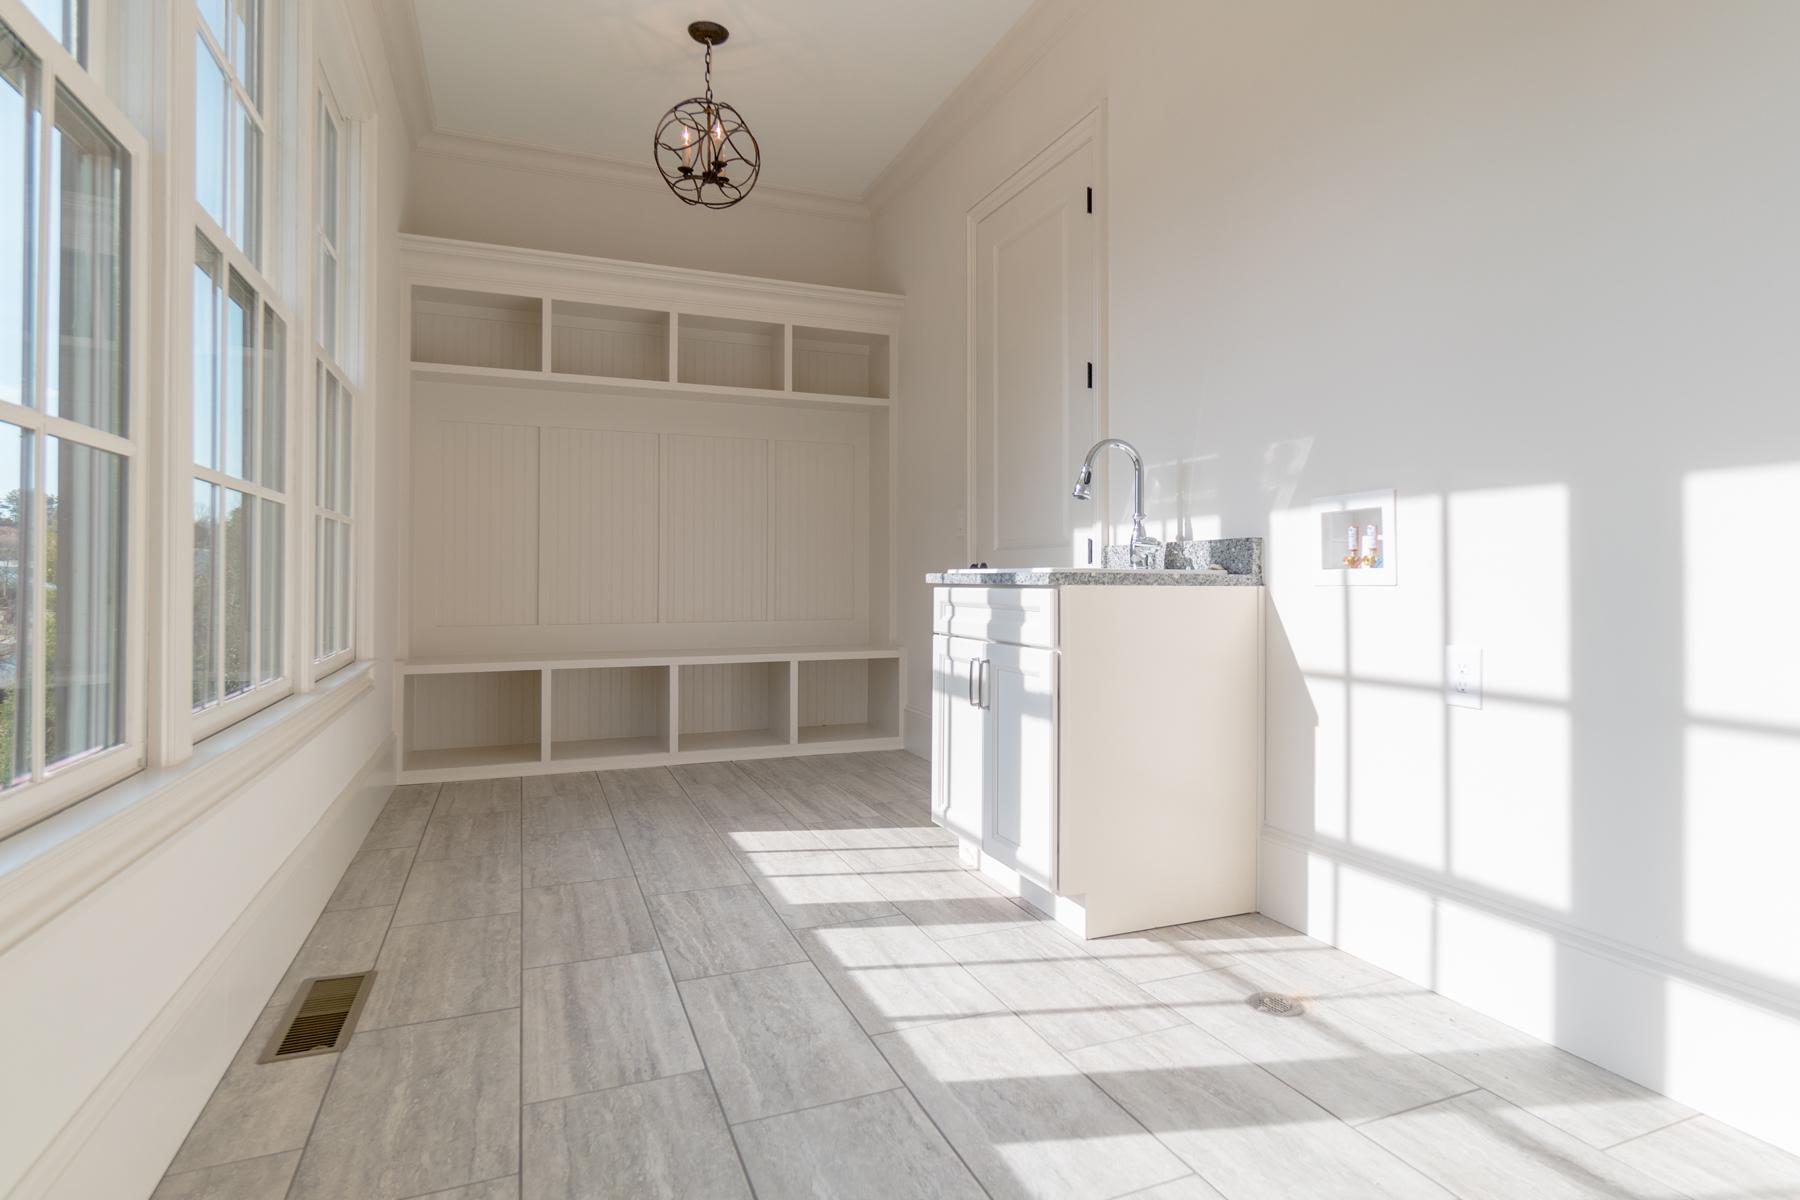 Additional photo for property listing at The Manor Cottages 3555 Glenalven Loop, Alpharetta, Джорджия 30004 Соединенные Штаты